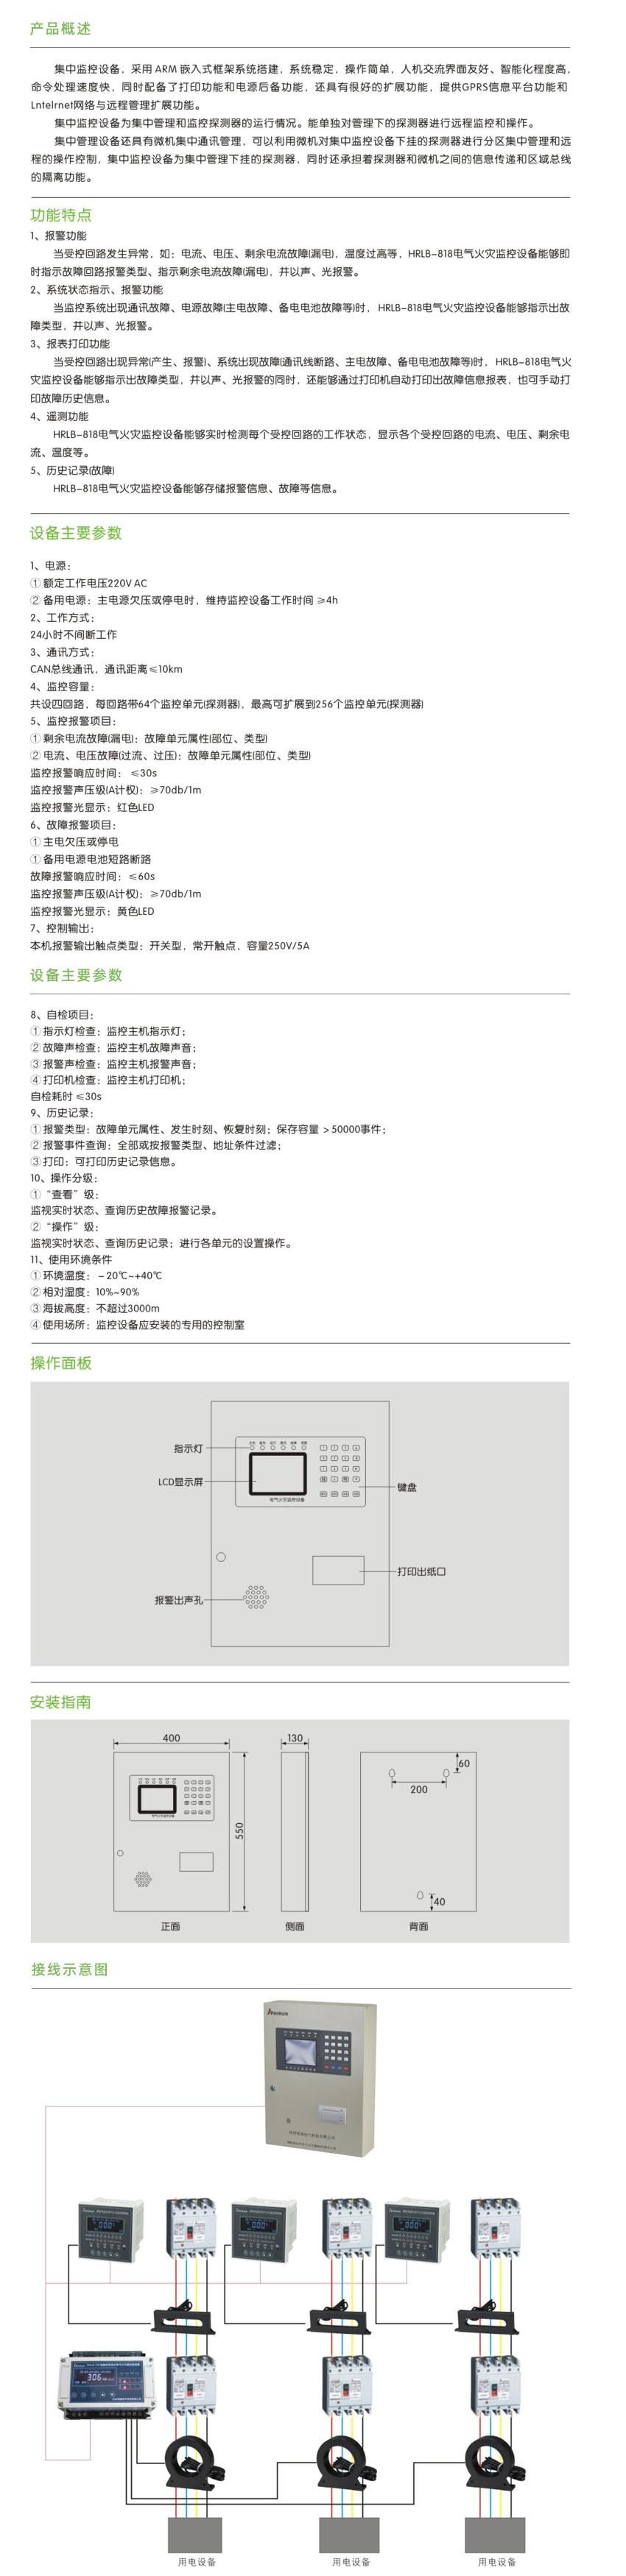 02_7_detail_HRLB-818(壁挂式)电气火灾监控设备.jpg